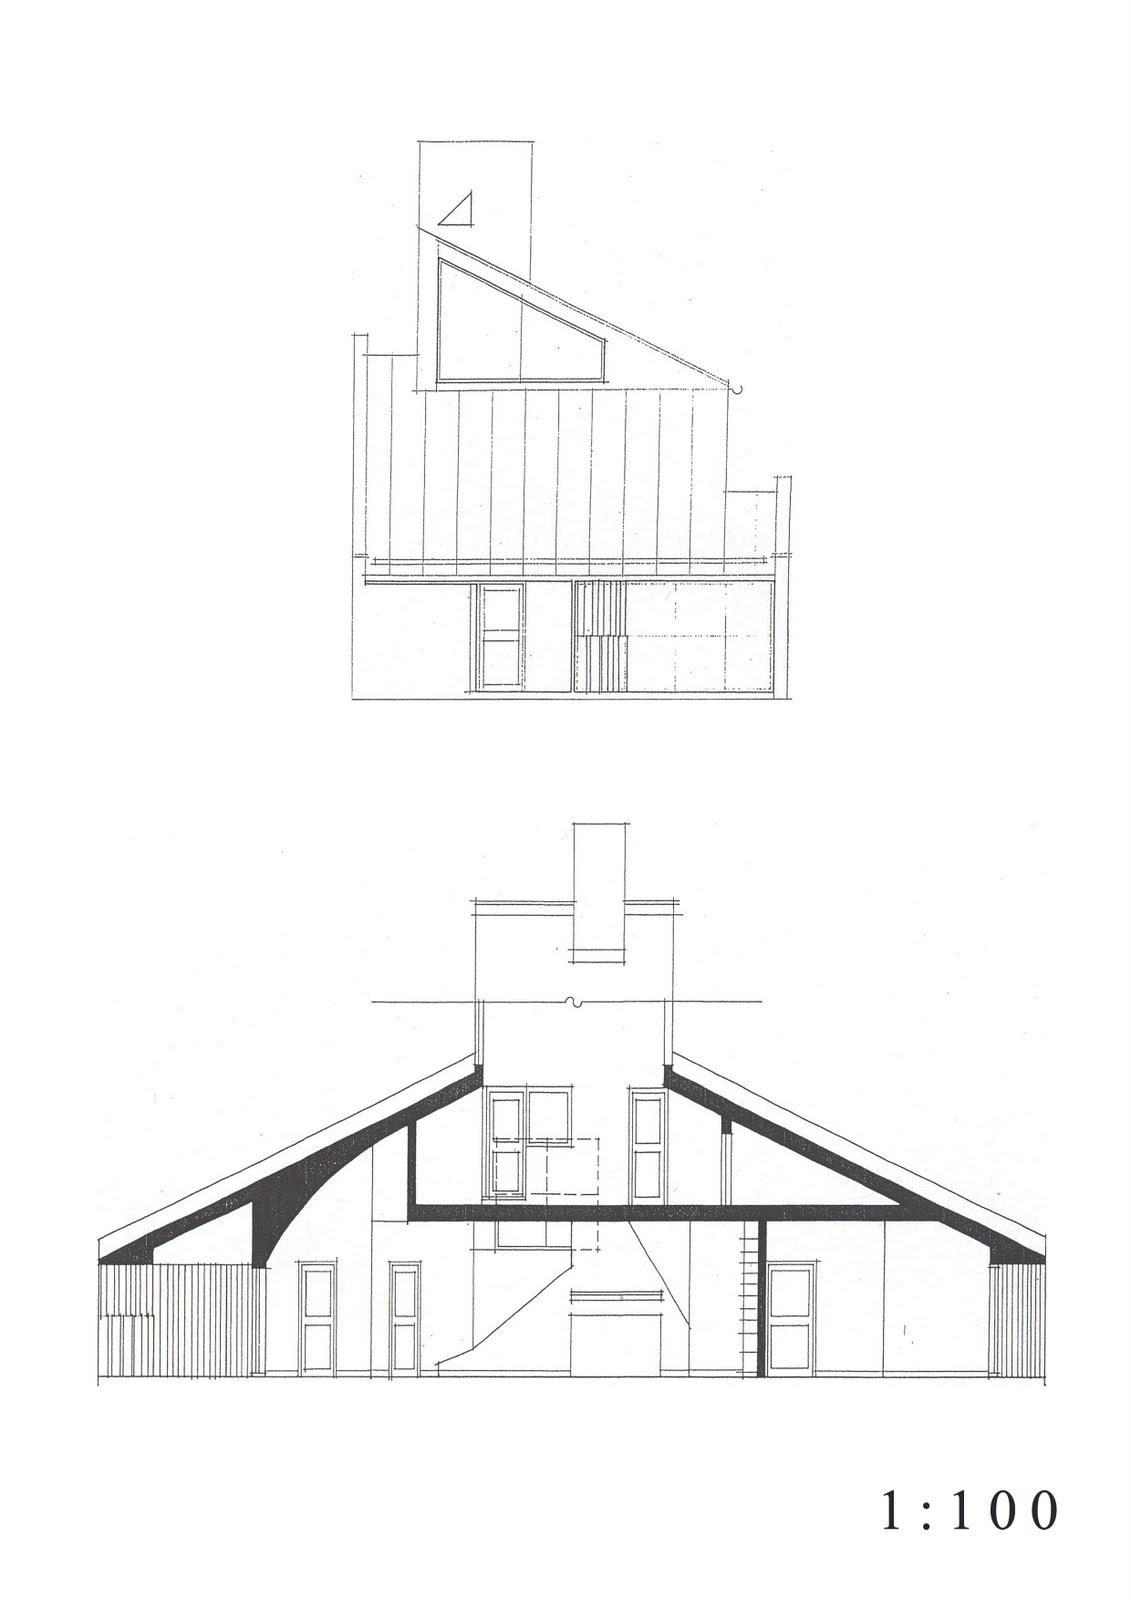 Scale100_A4_04 Vanna Venturi House Plan Section Elevation on fisher house elevation, vanna venturi interior, kaufmann house elevation, eames house elevation, vanna venturi sections dimensions, tugendhat house elevation,